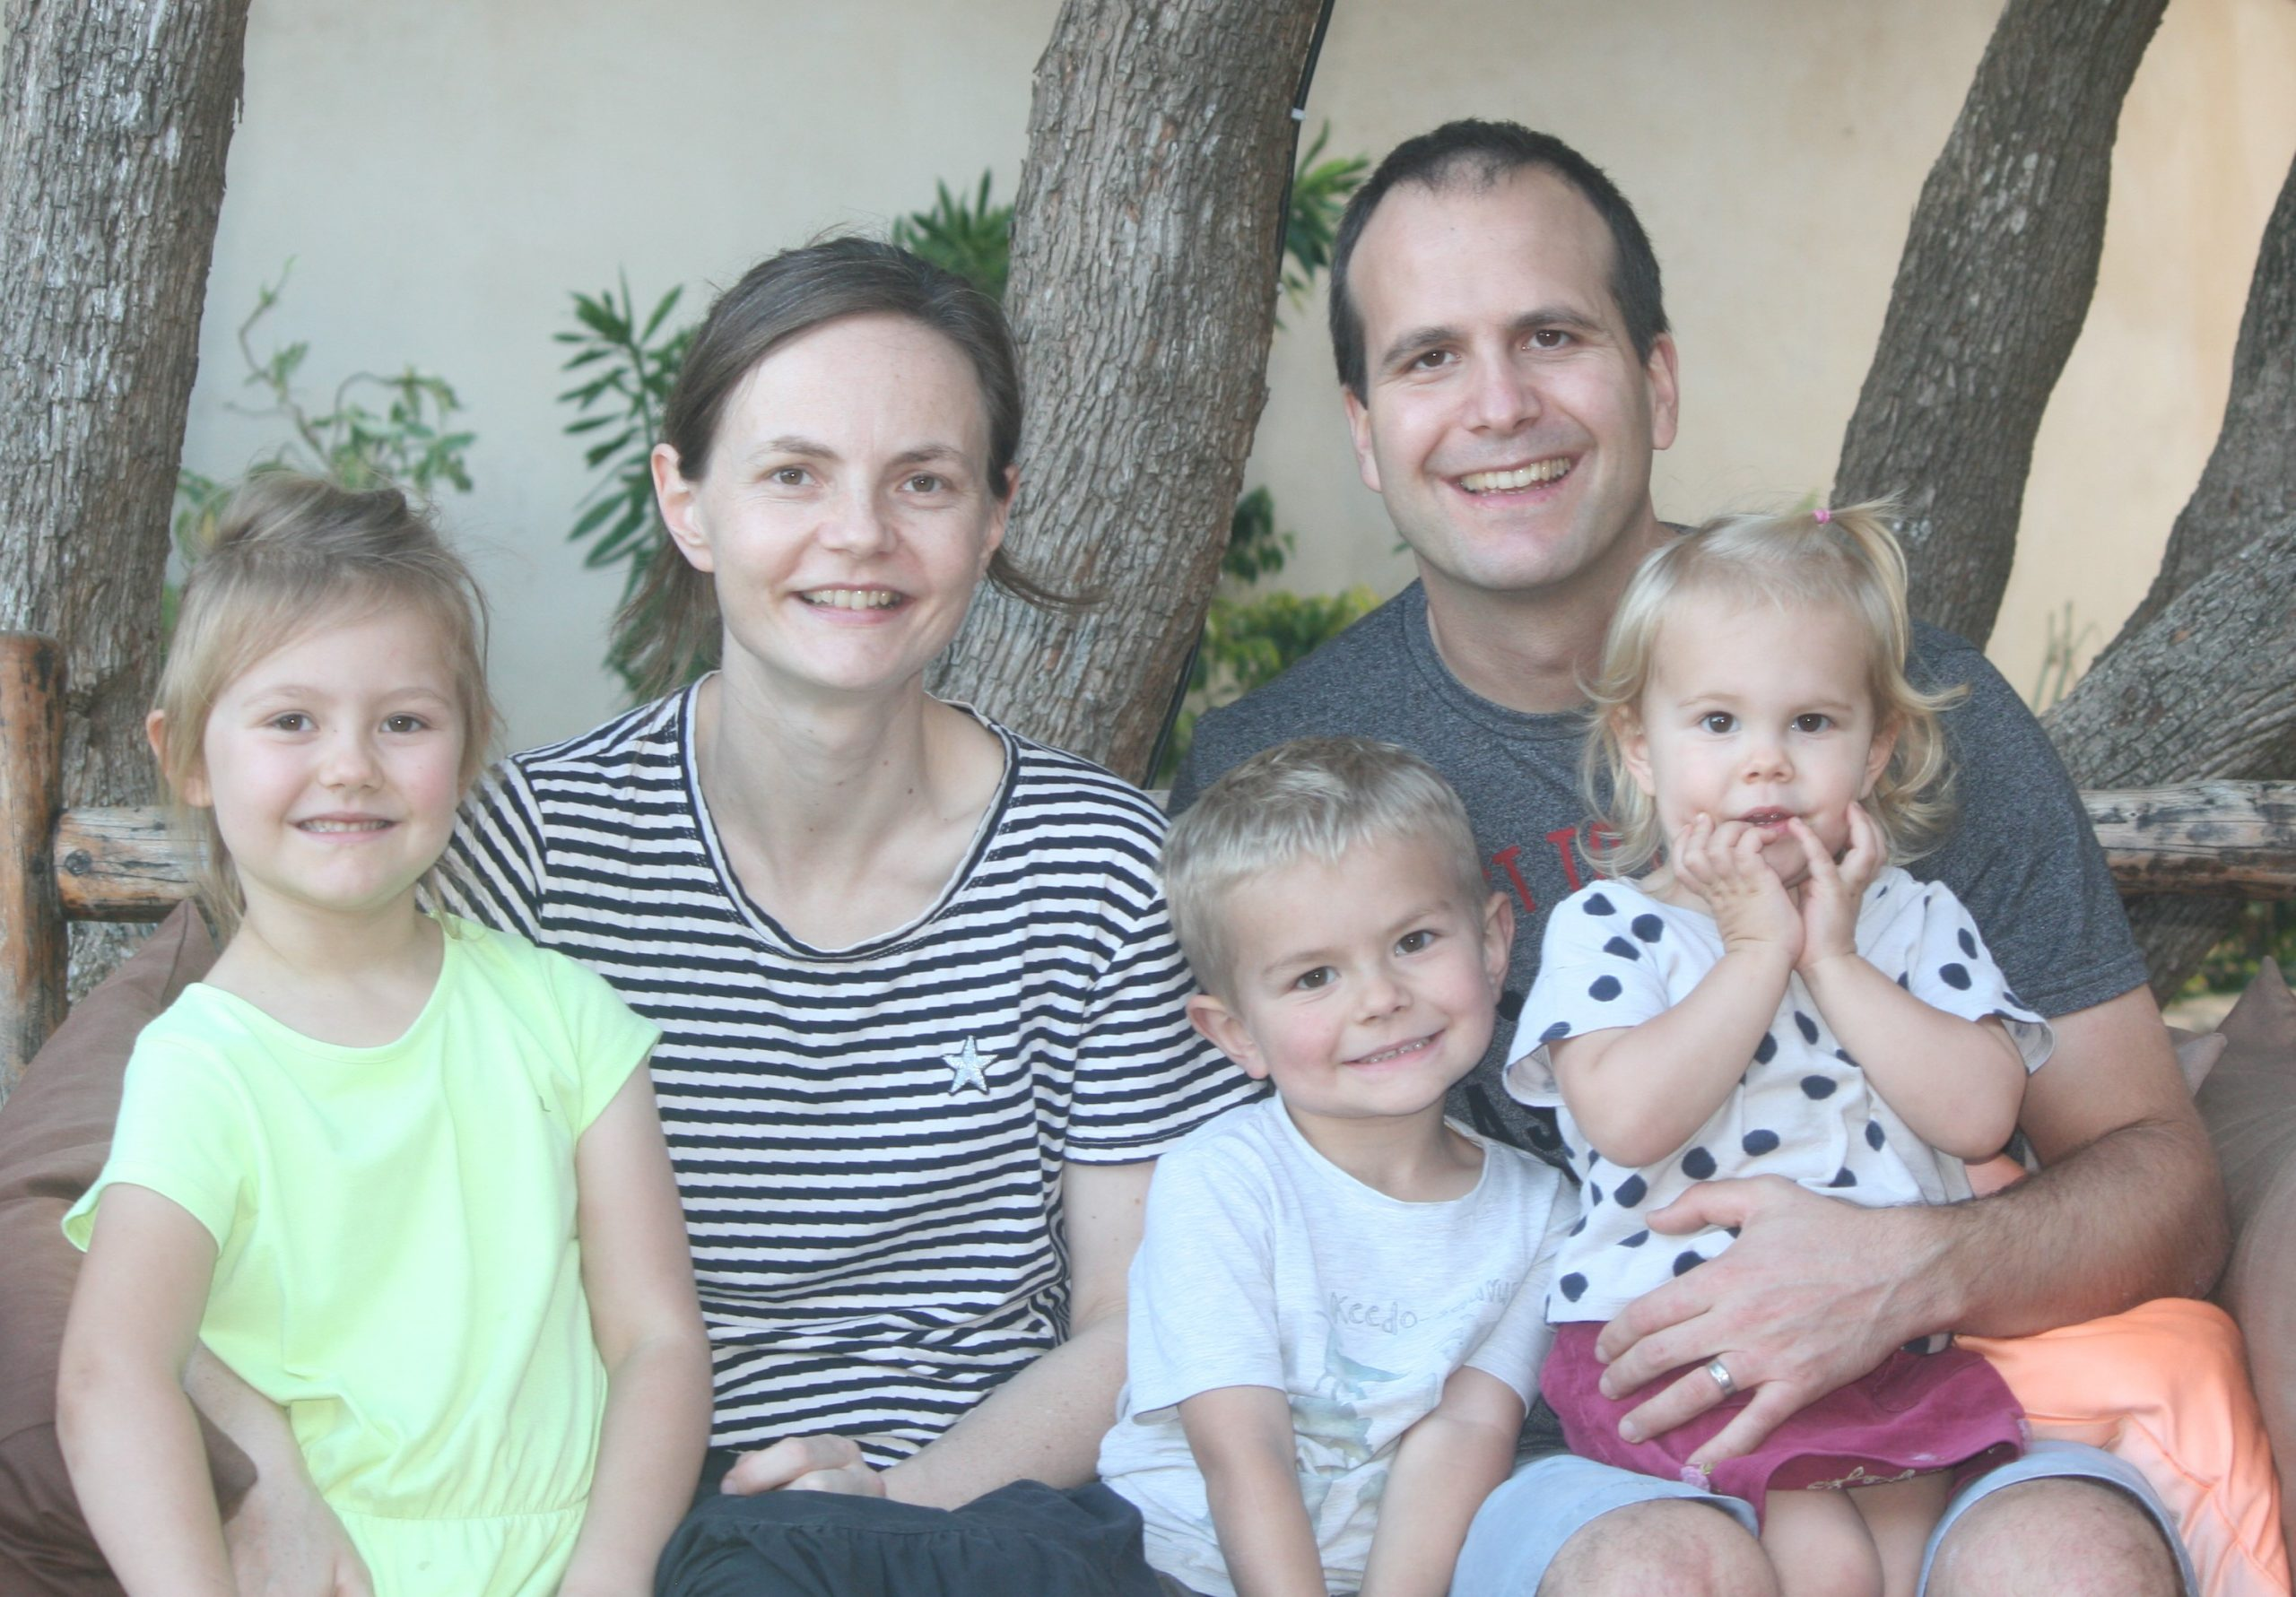 Mr Yoann and Dr Rebecca Escach with their children